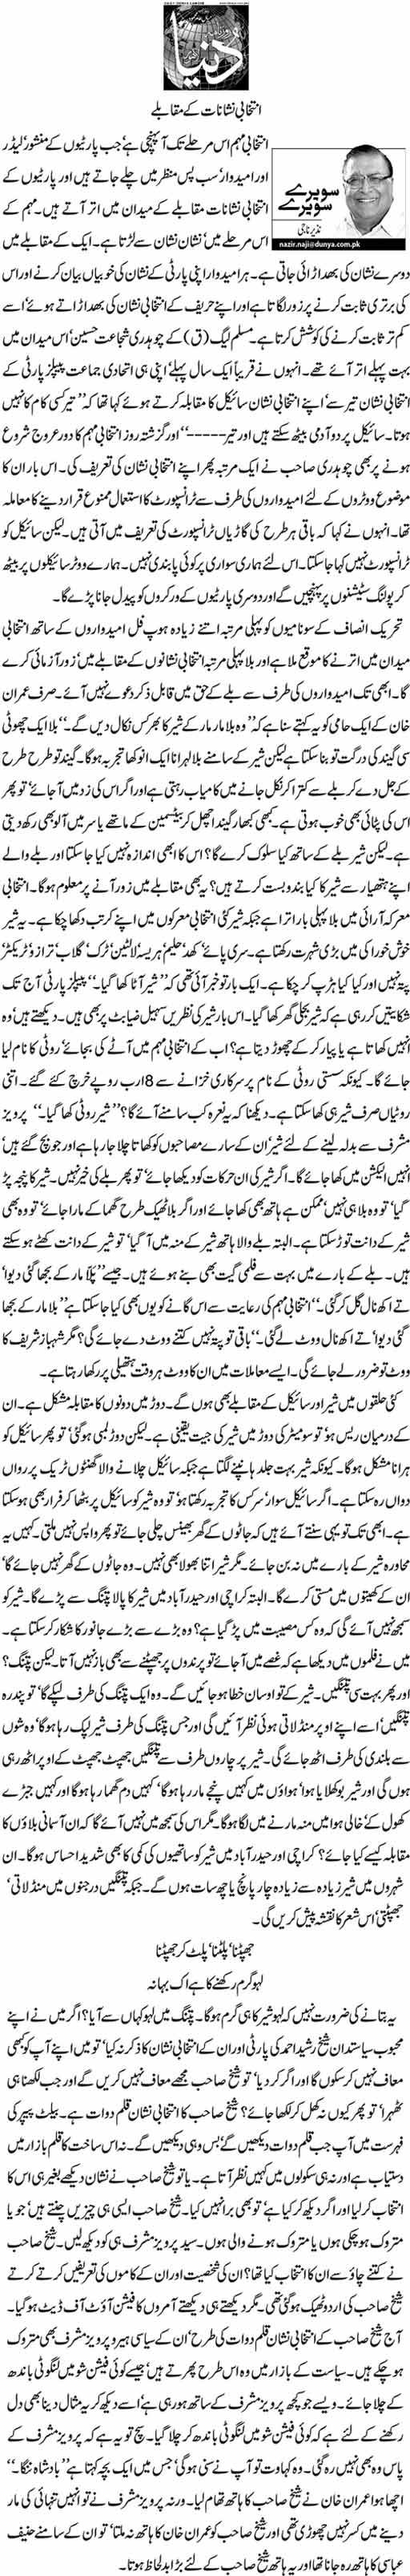 Intekhabi Nishanaat K Muqabilay - Nazeer Naji